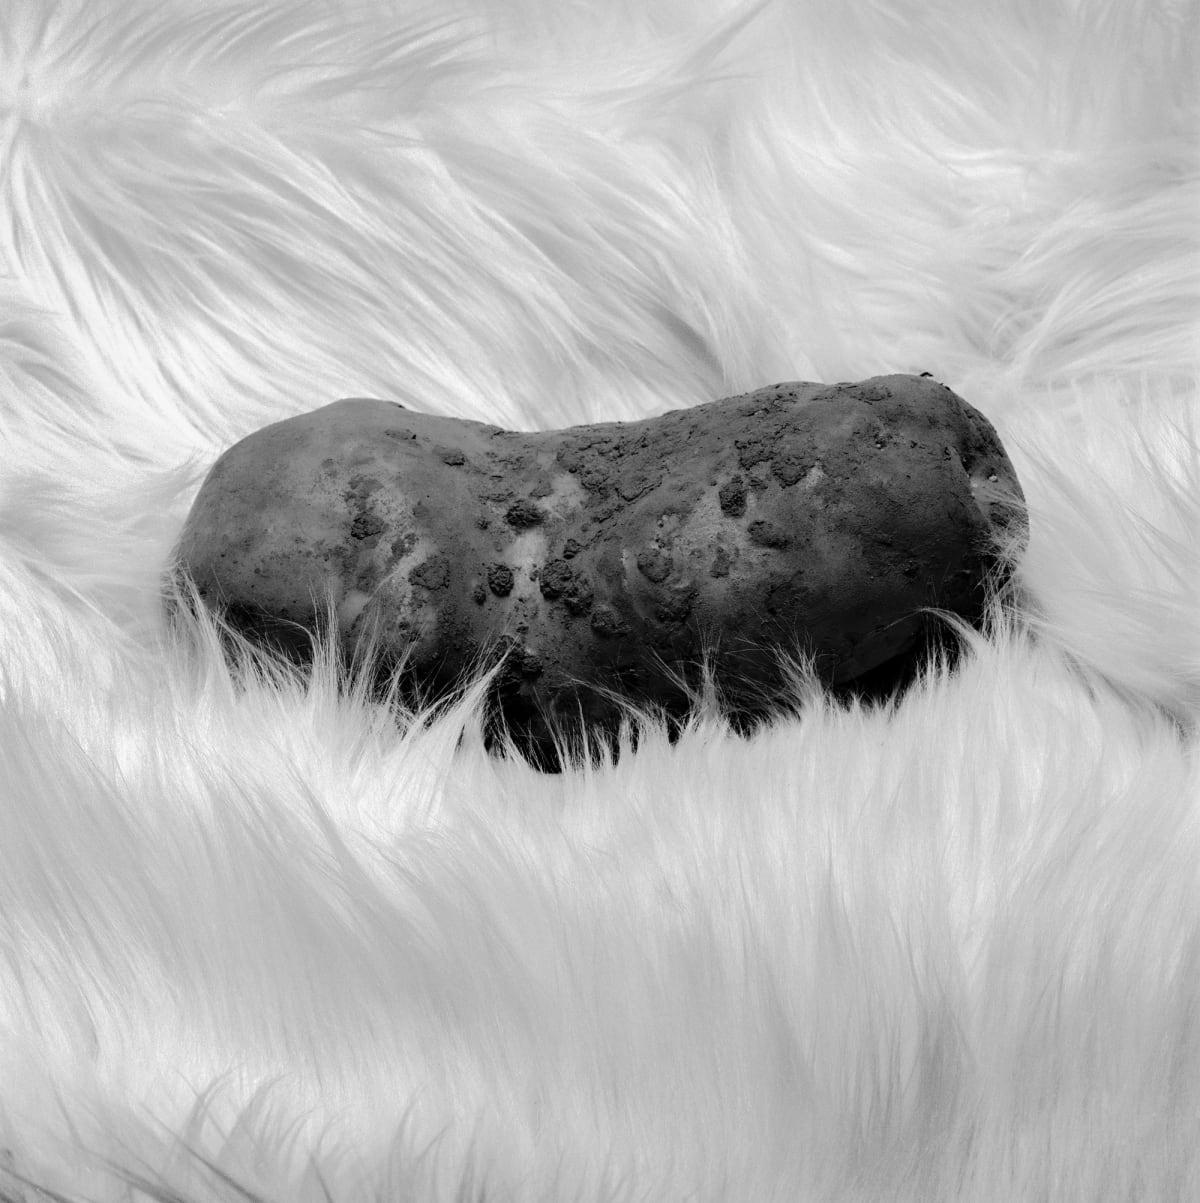 Brian Griffin, Potato on Fur, 2017